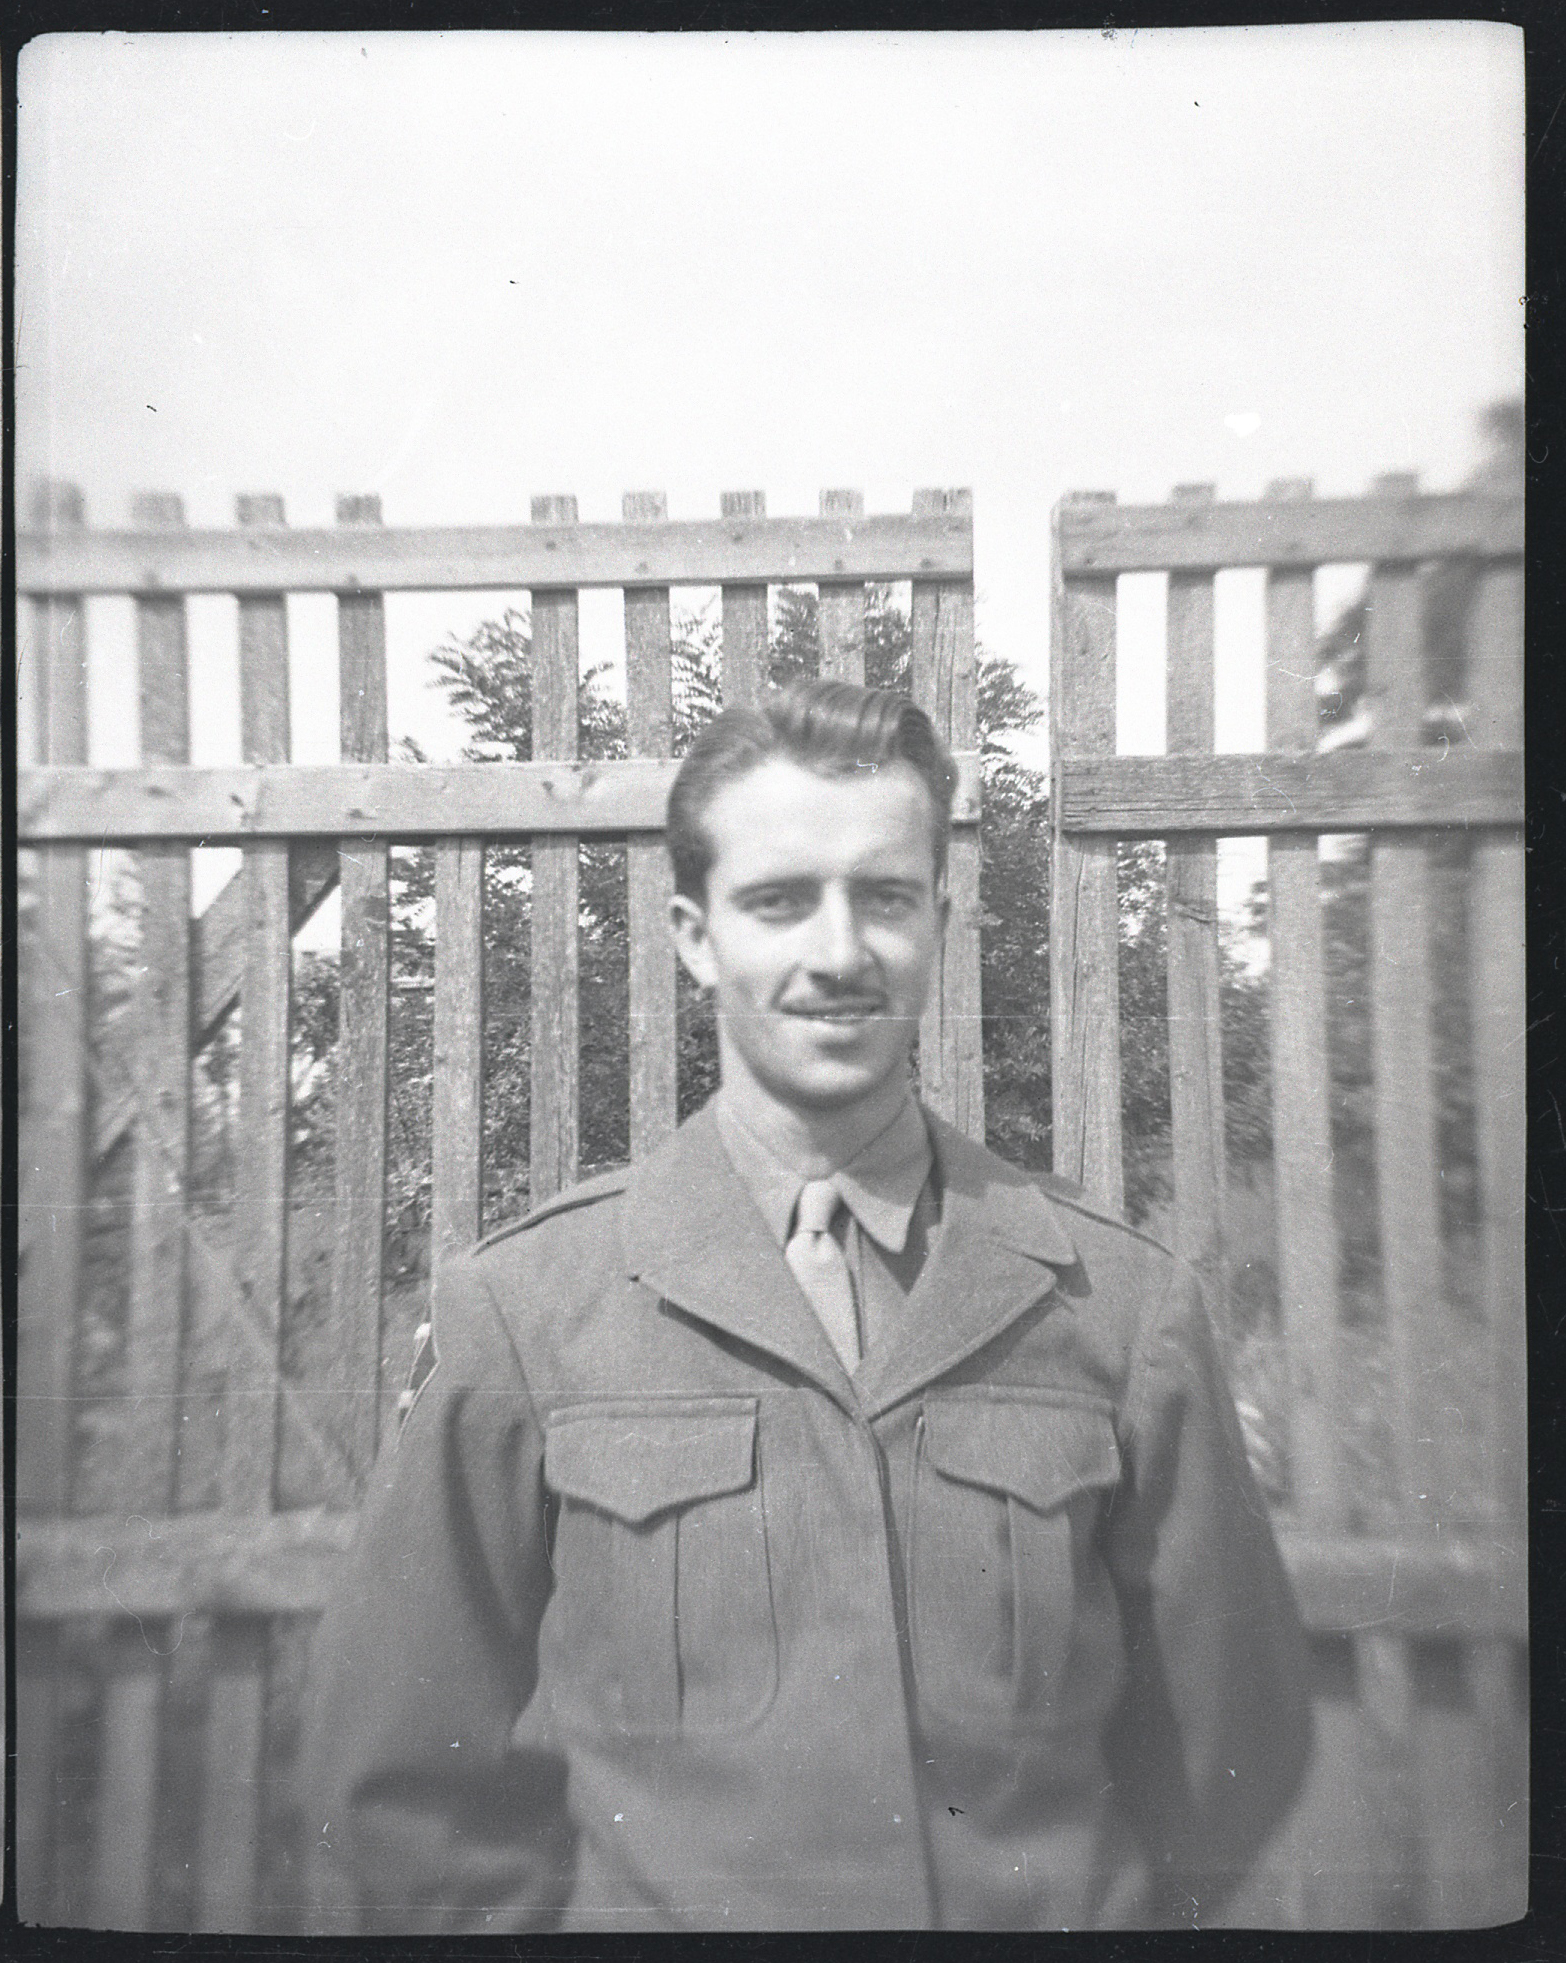 Charlie Green, Czechoslovakia 1945